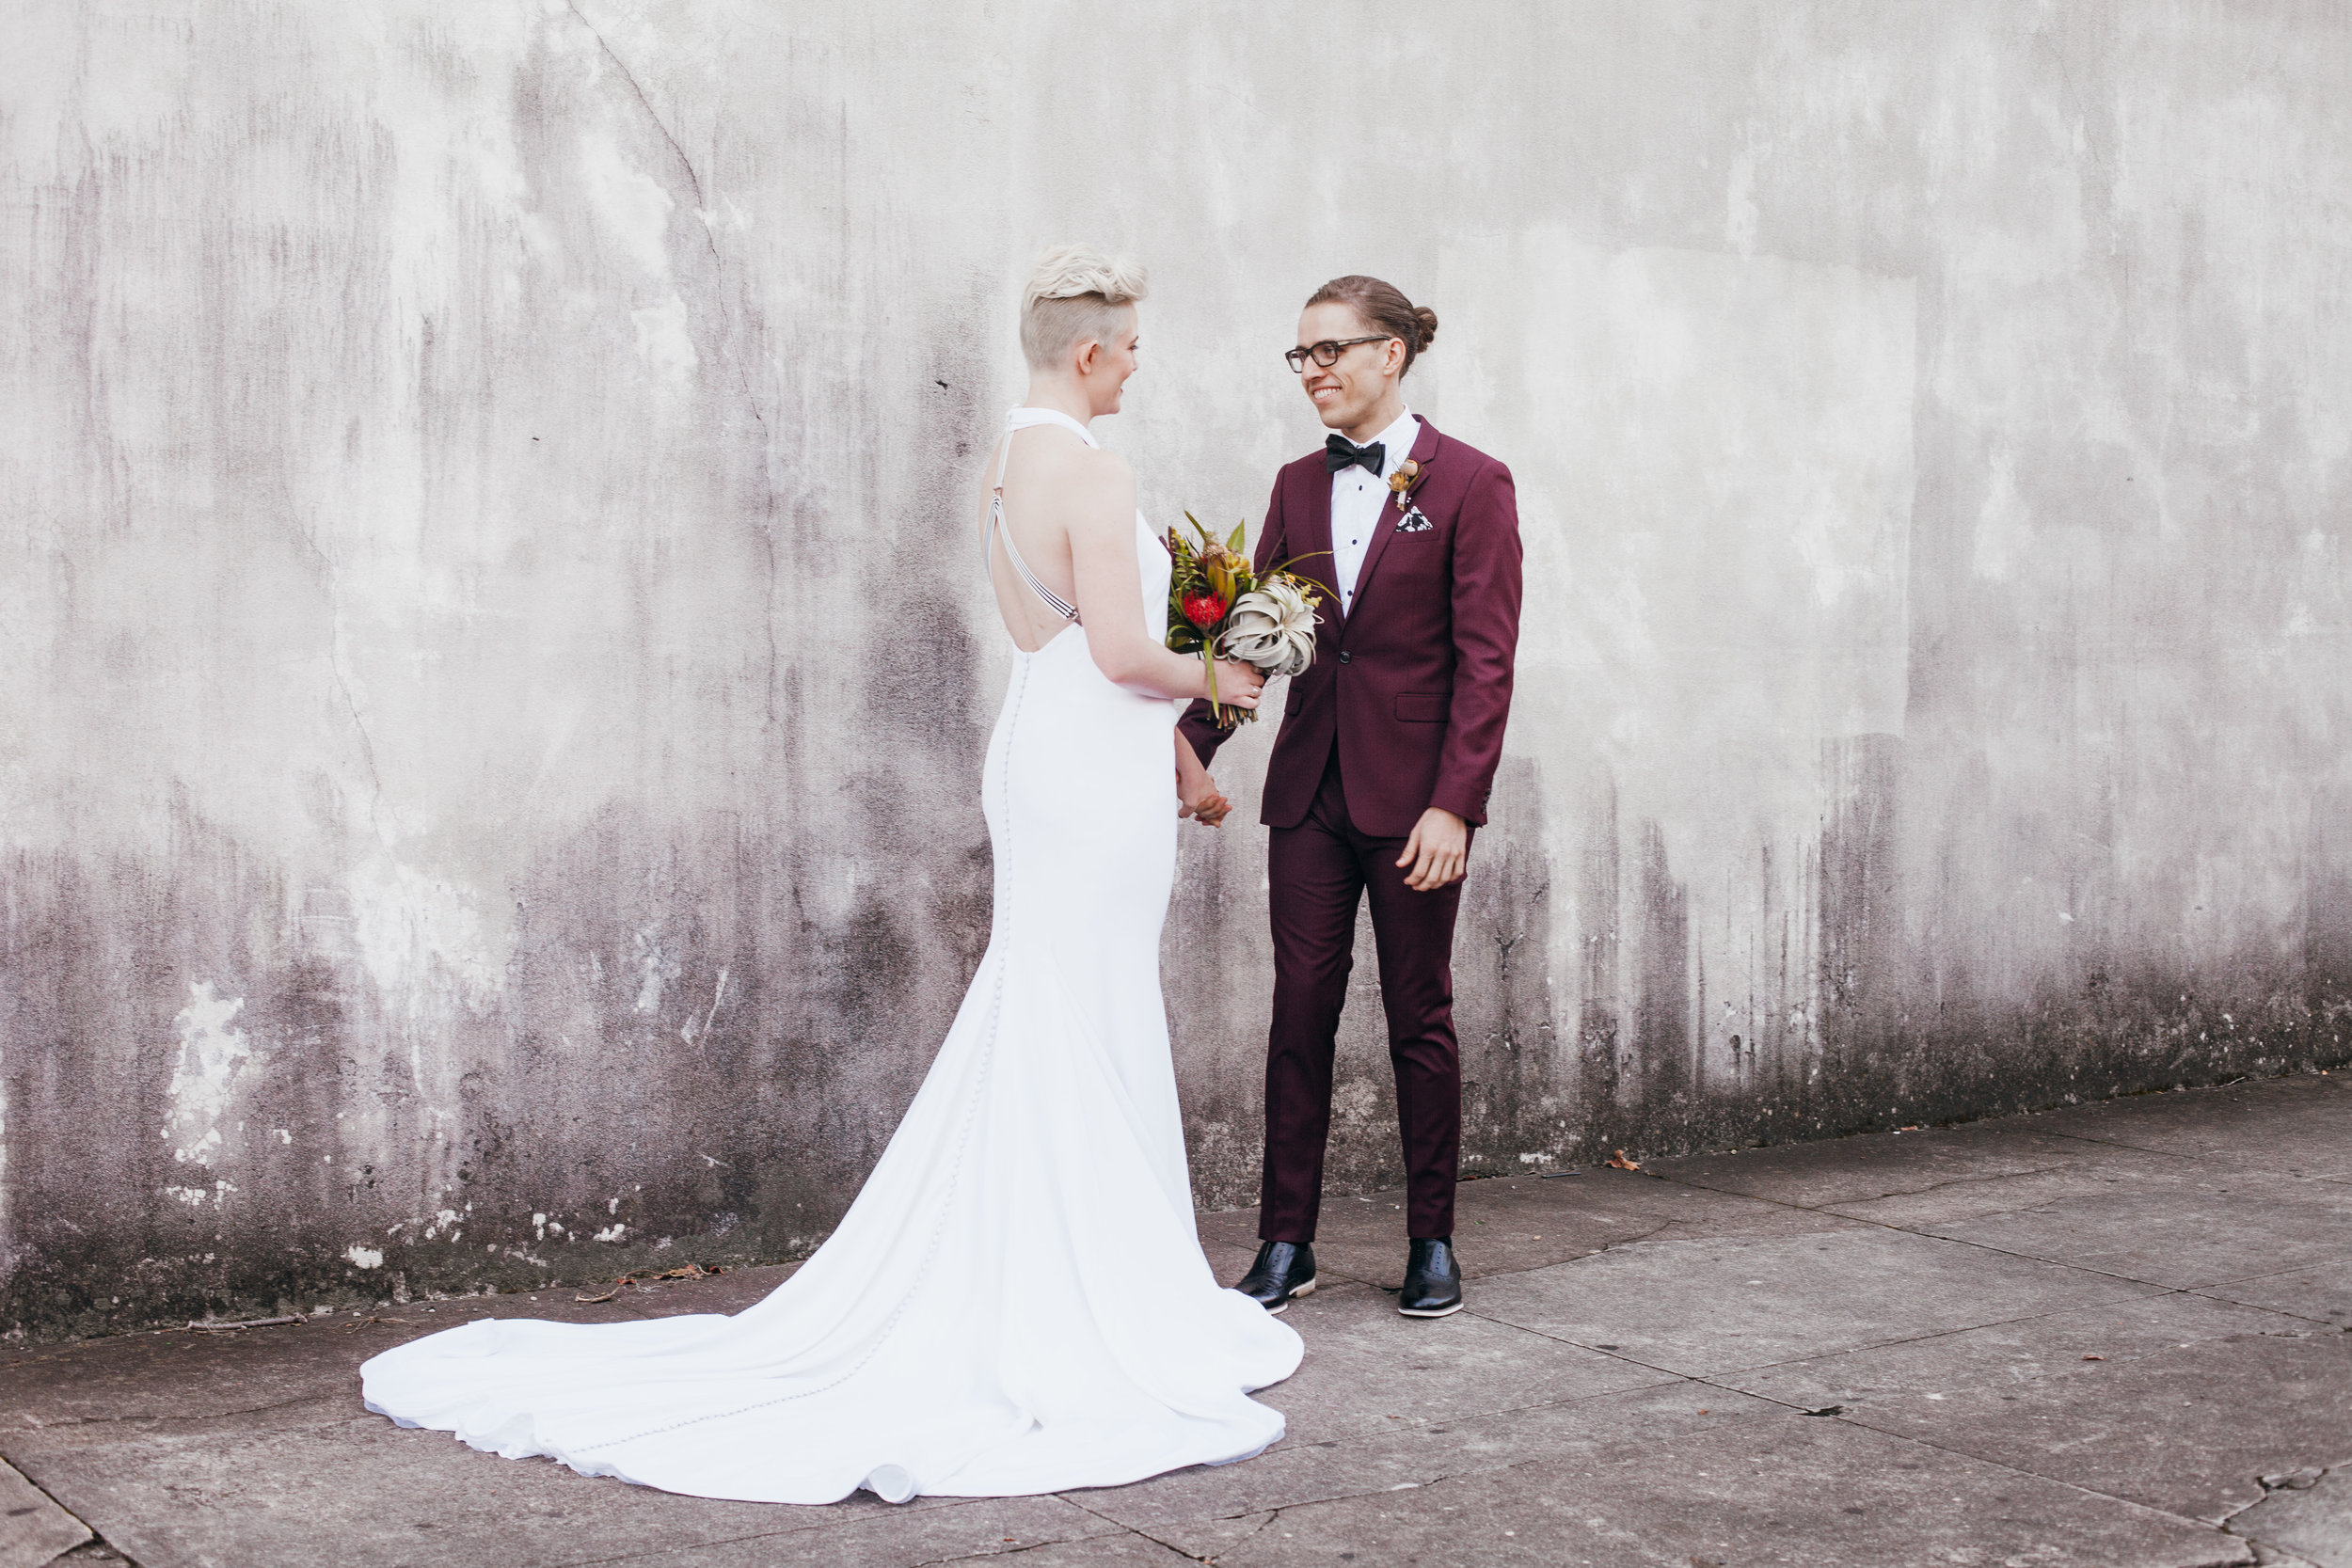 julia-hembree-photography-eden-village-church-wedding-savannah-warehouse-wedding-ivory-and-beau-bridal-boutique-savannah-florist-savannah-wedding-planner-savannah-event-design-scad-wedding-artist-wedding-savannah-funky-wedding-handmade-wedding-22.jpg